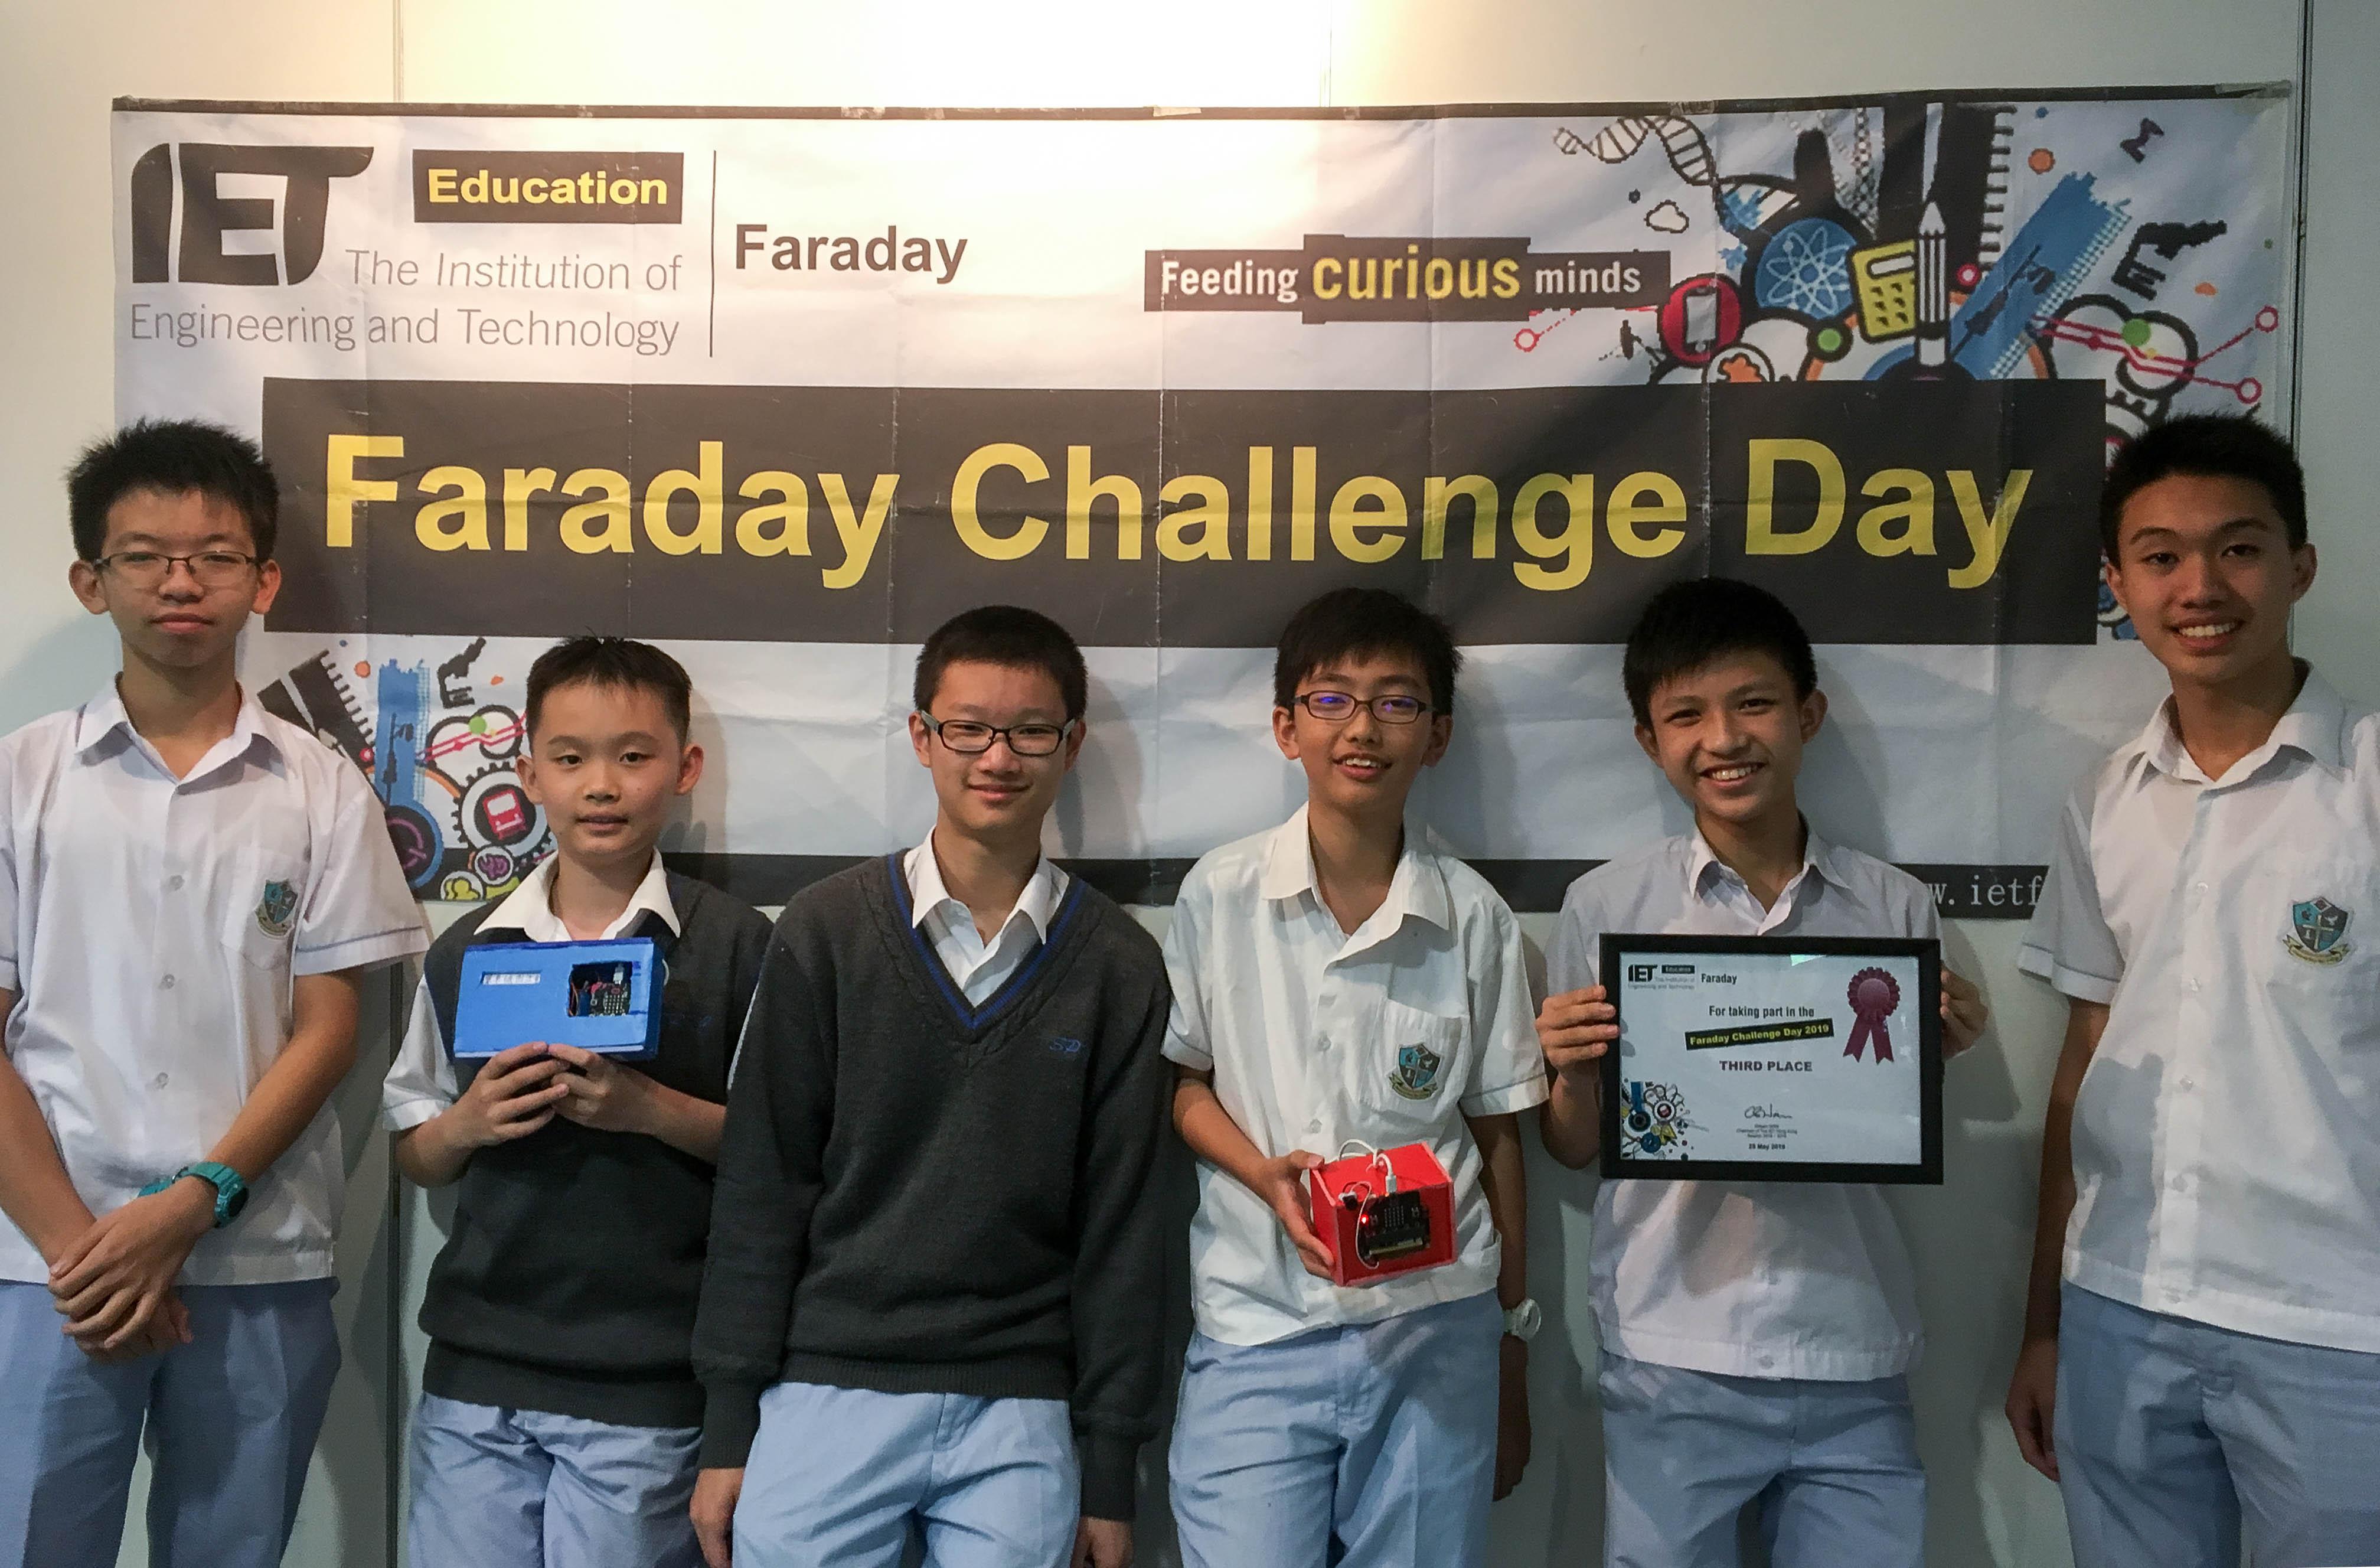 IET Faraday Challenge Days 2019